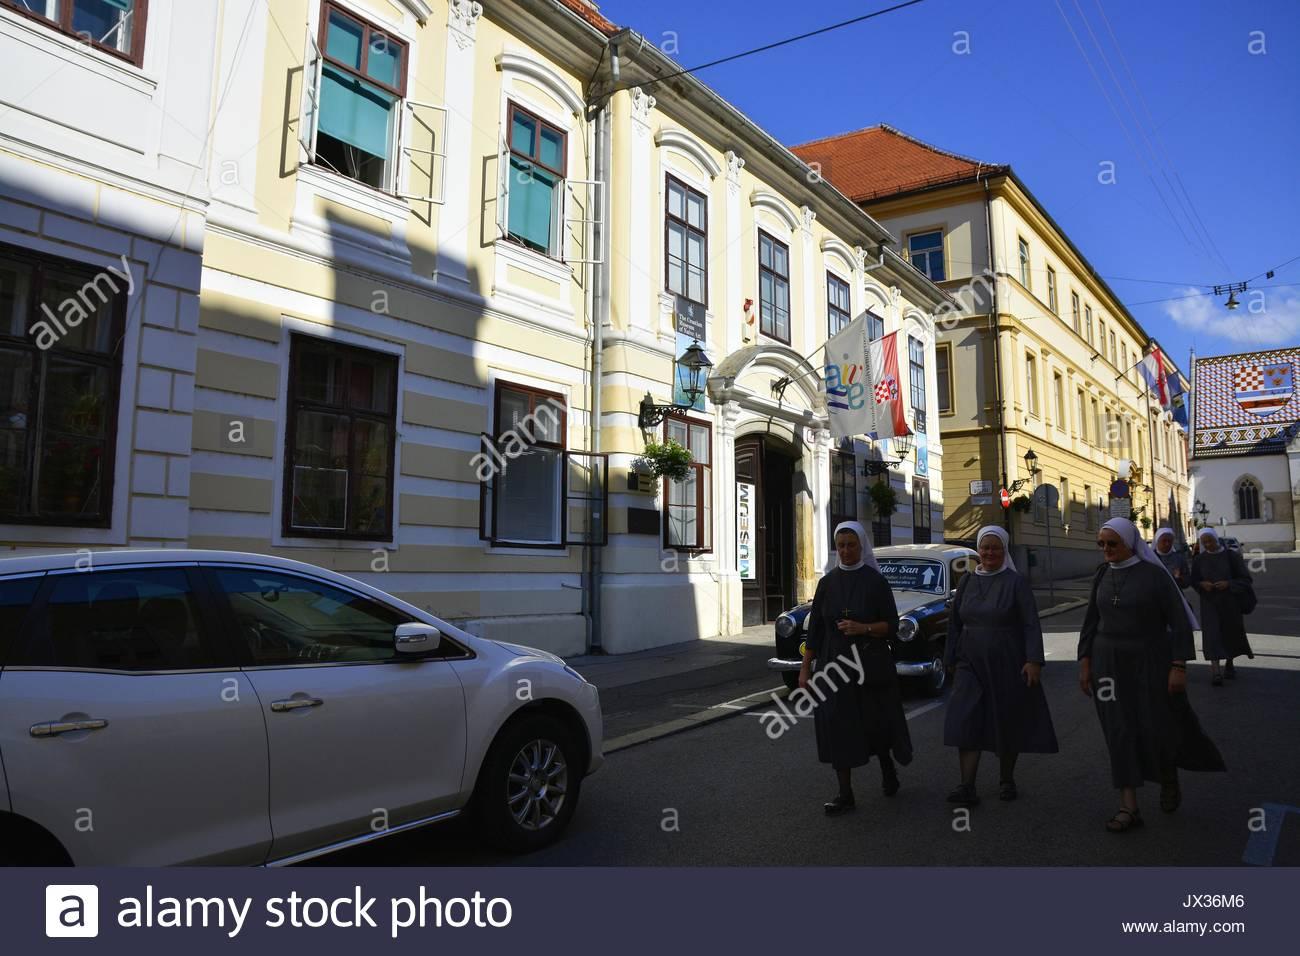 Zagreb,Croatia. The Croatian Museum of Naïve Art - Stock Image